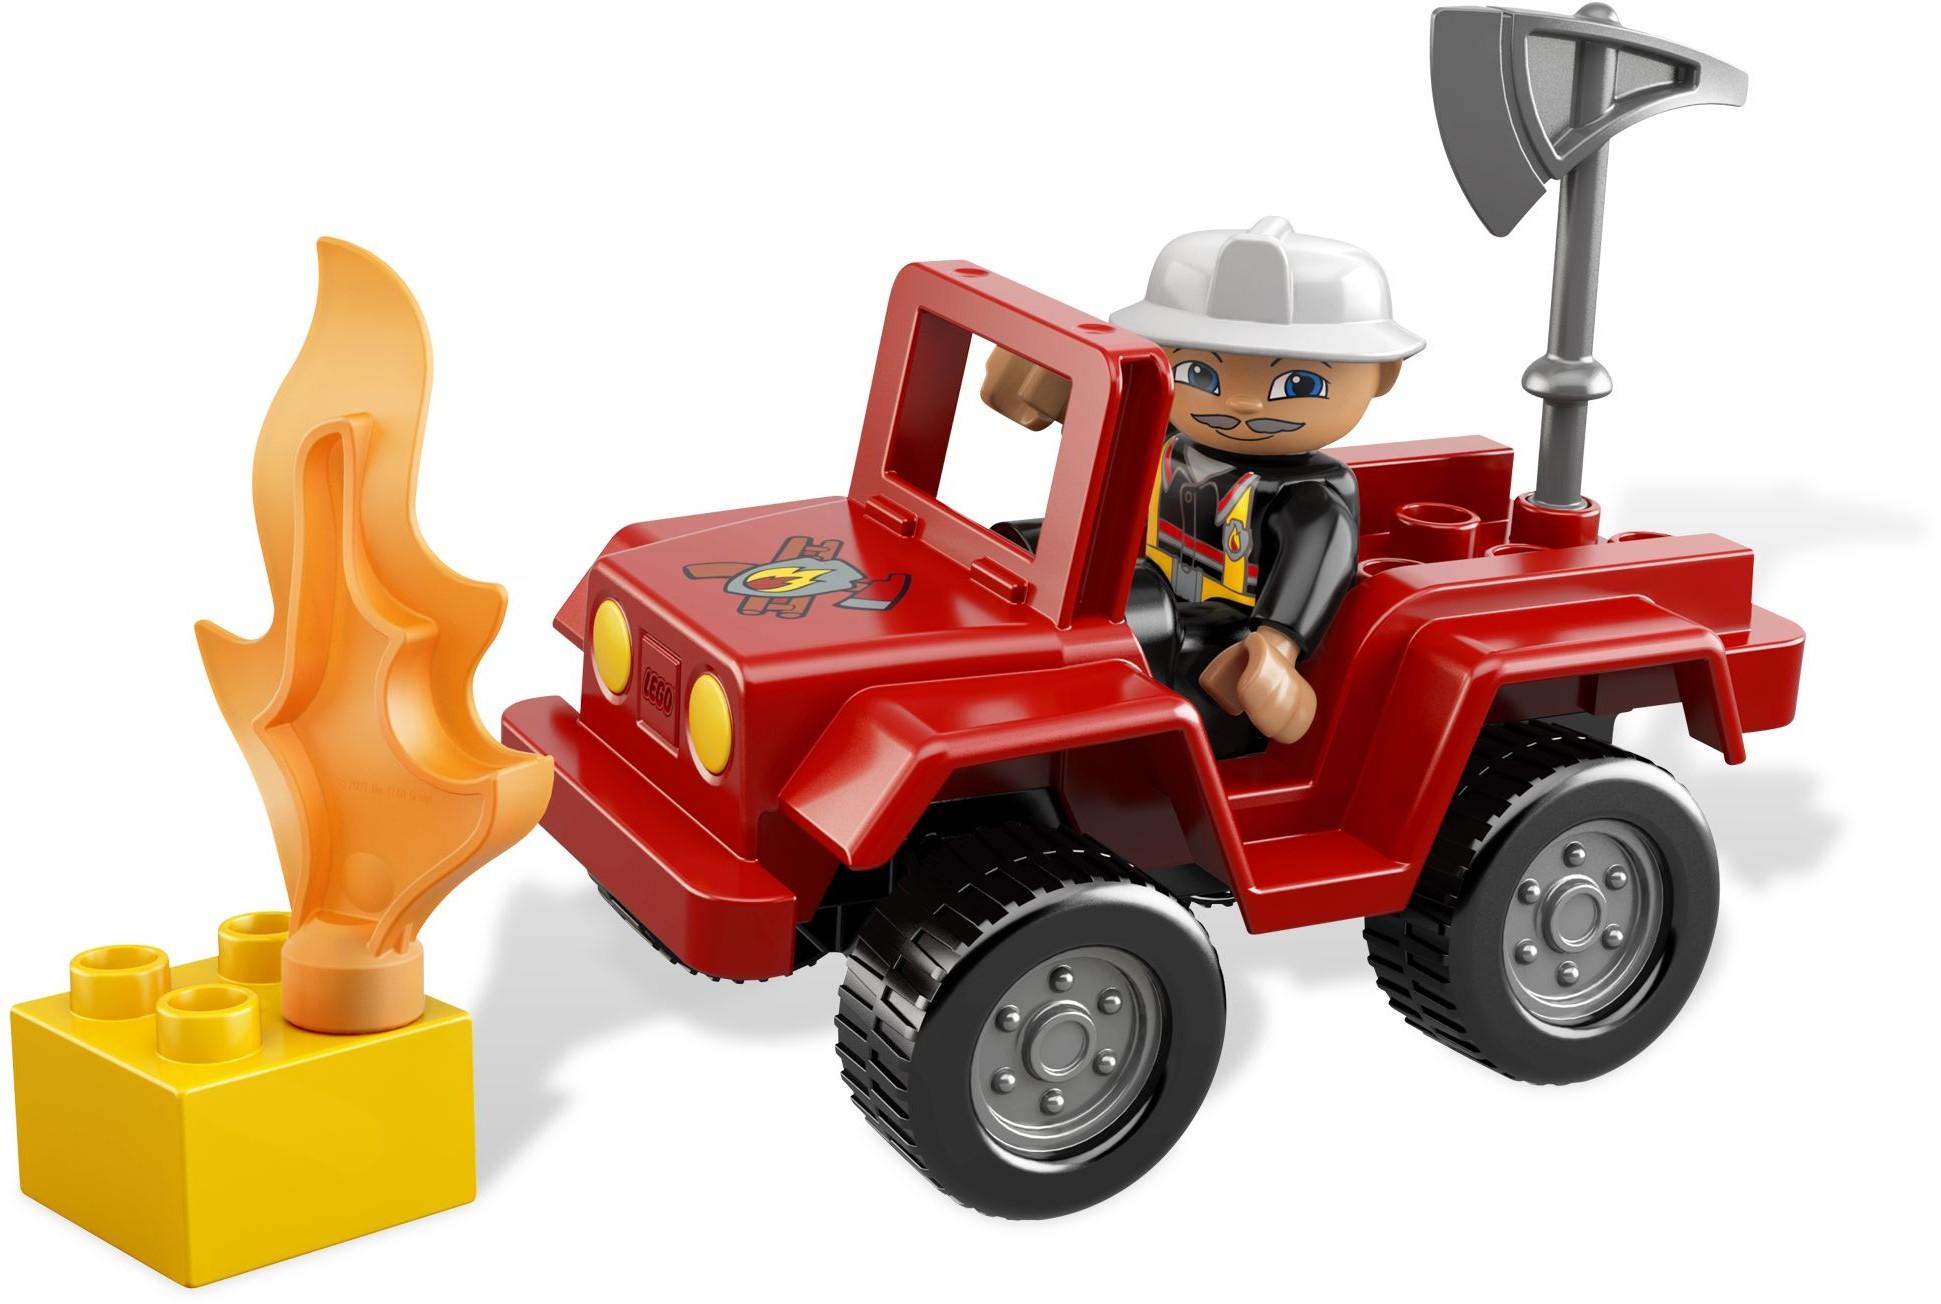 Duplo Fire Brickset Lego Set Guide And Database 10593 Station Chief